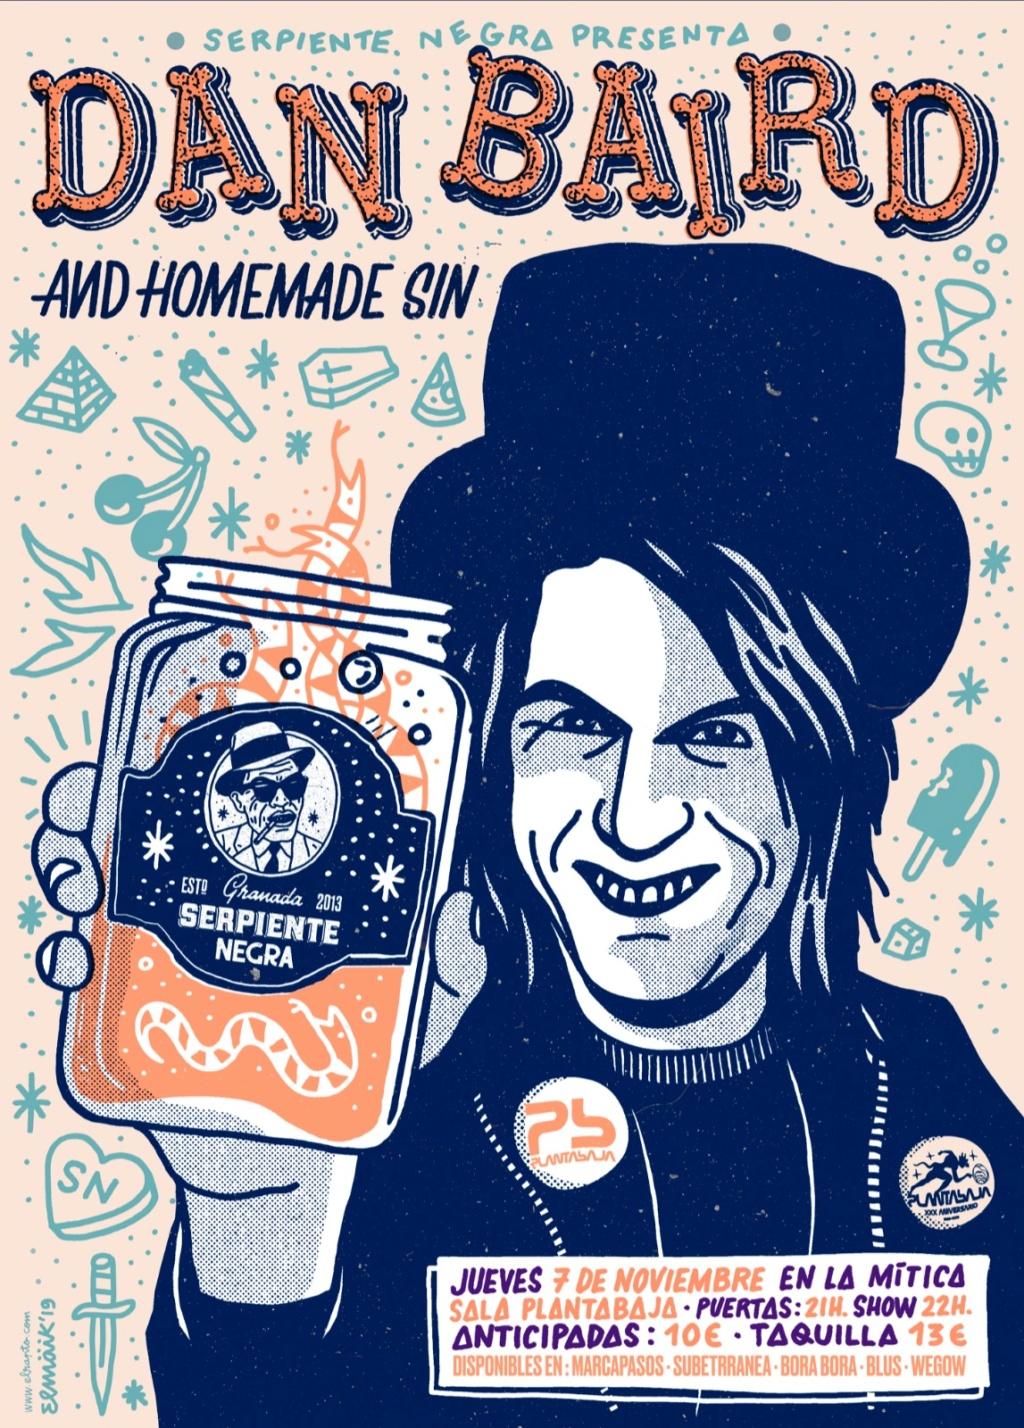 Dan Baird and Homemade Sin - Página 18 Whatsa10